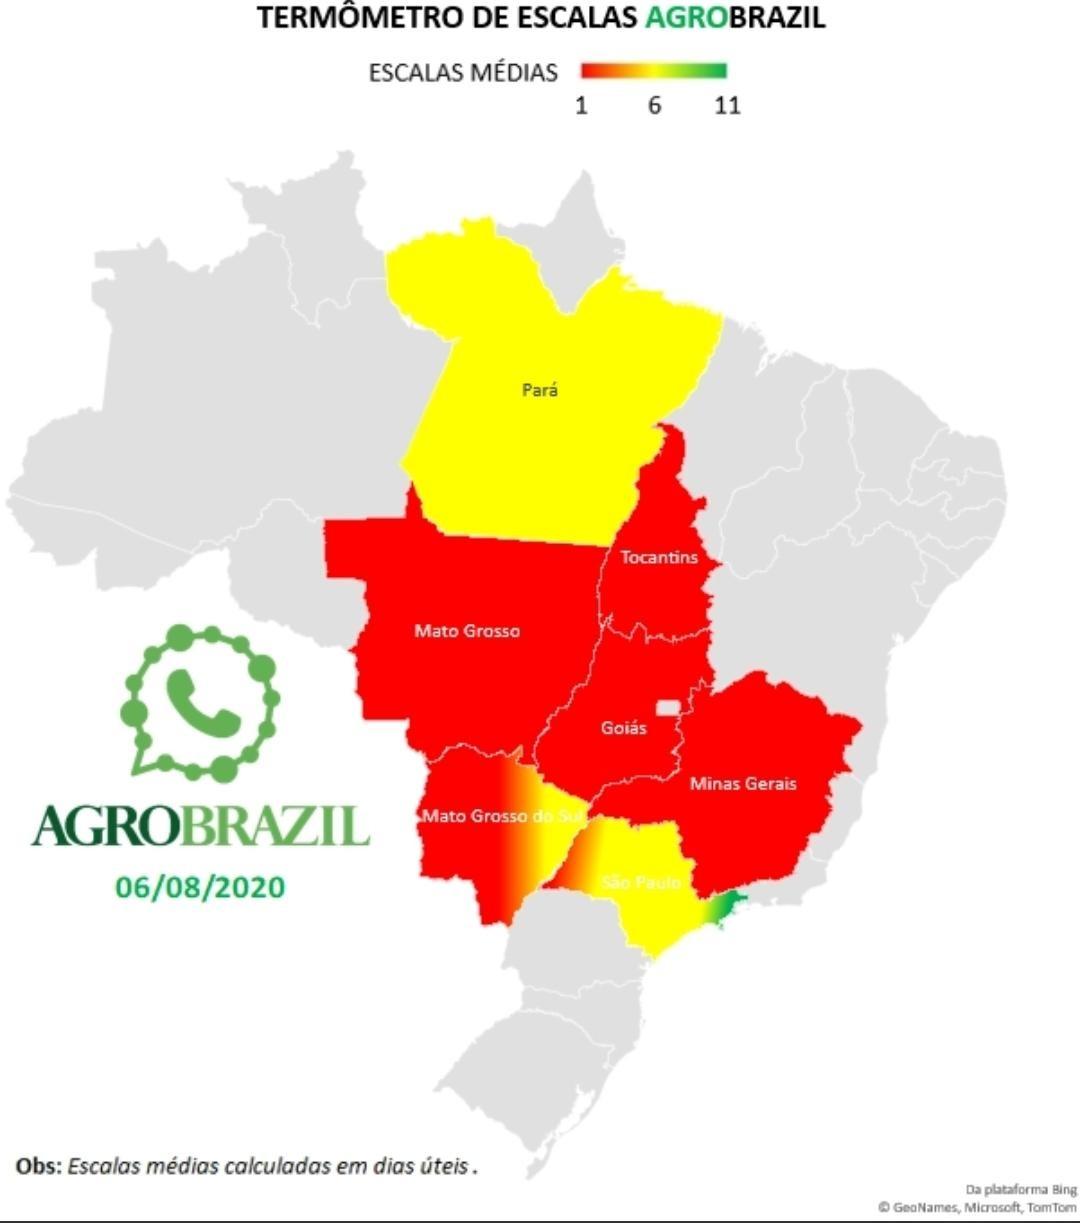 Escalas de abate no país elaborado pelo o aplicativo da Agrobrazil